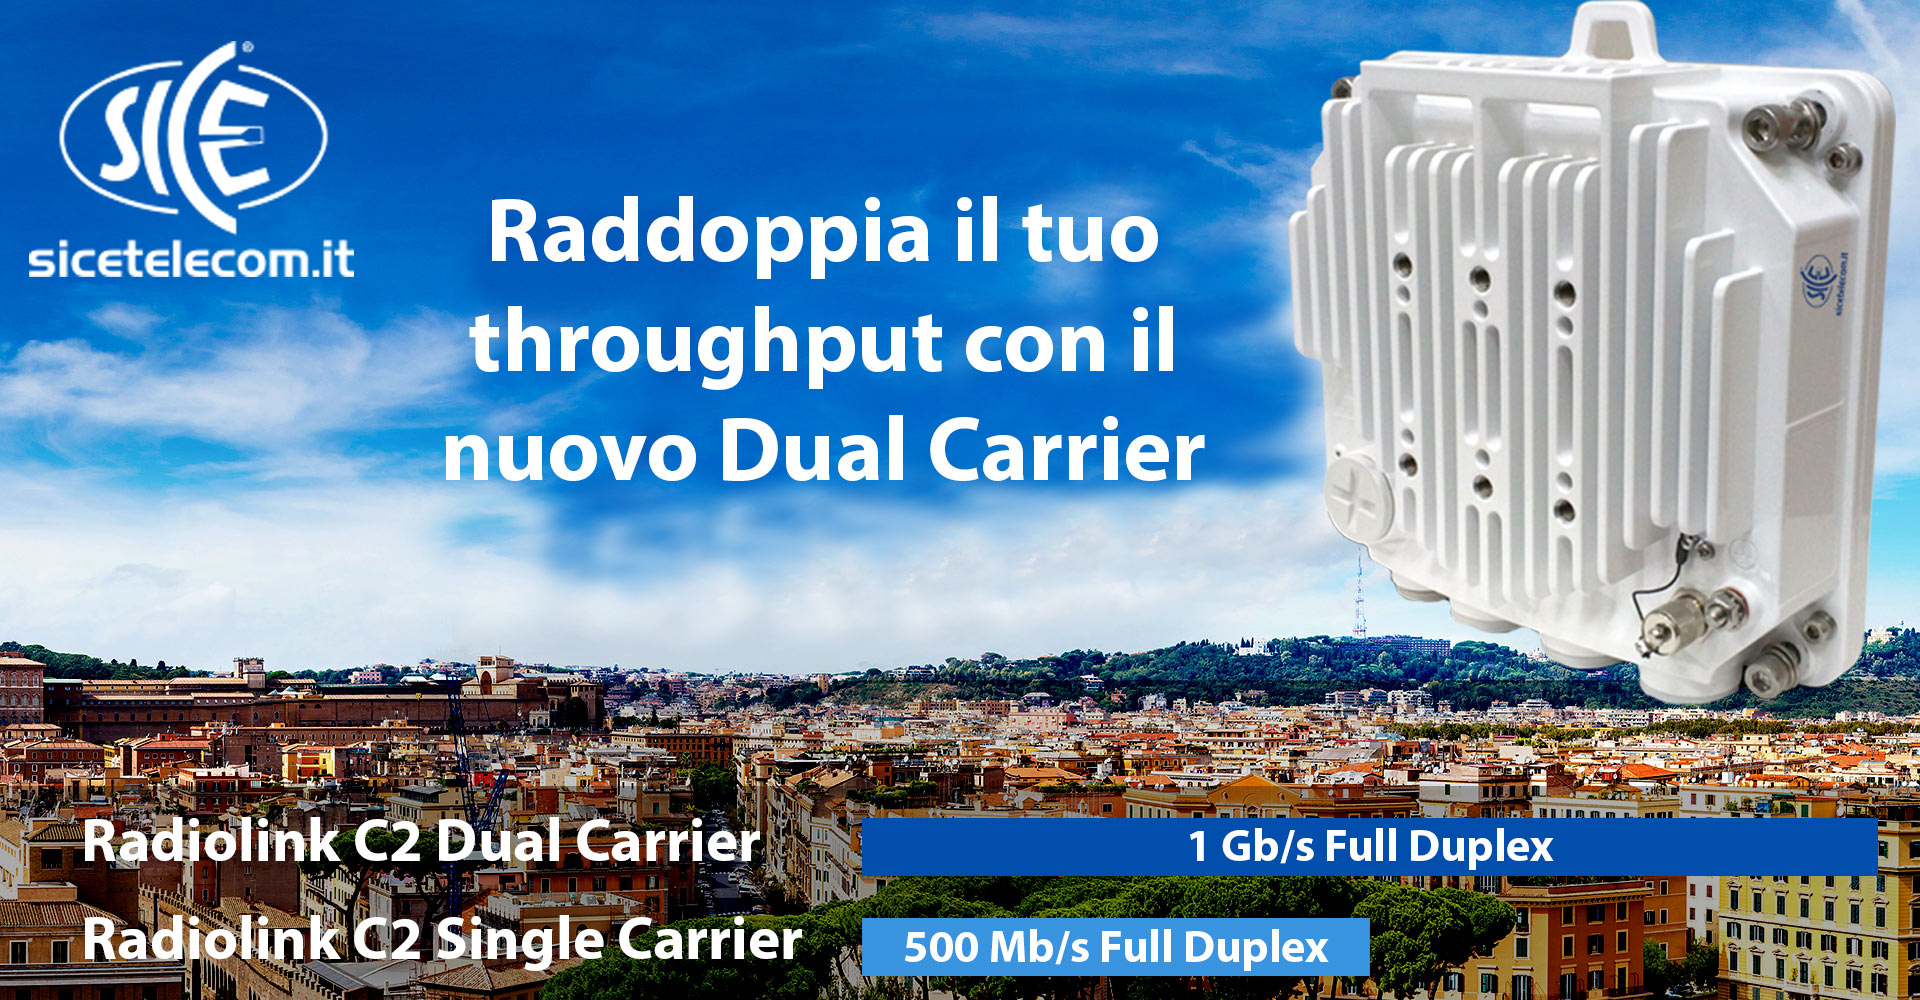 Ponte Radio Radiolink C2 24 GHz unlicensed. Raddoppia il throughput con il nuovo Dual Carrier. Blog News & Eventi  24ghz ponti radio punto punto sice